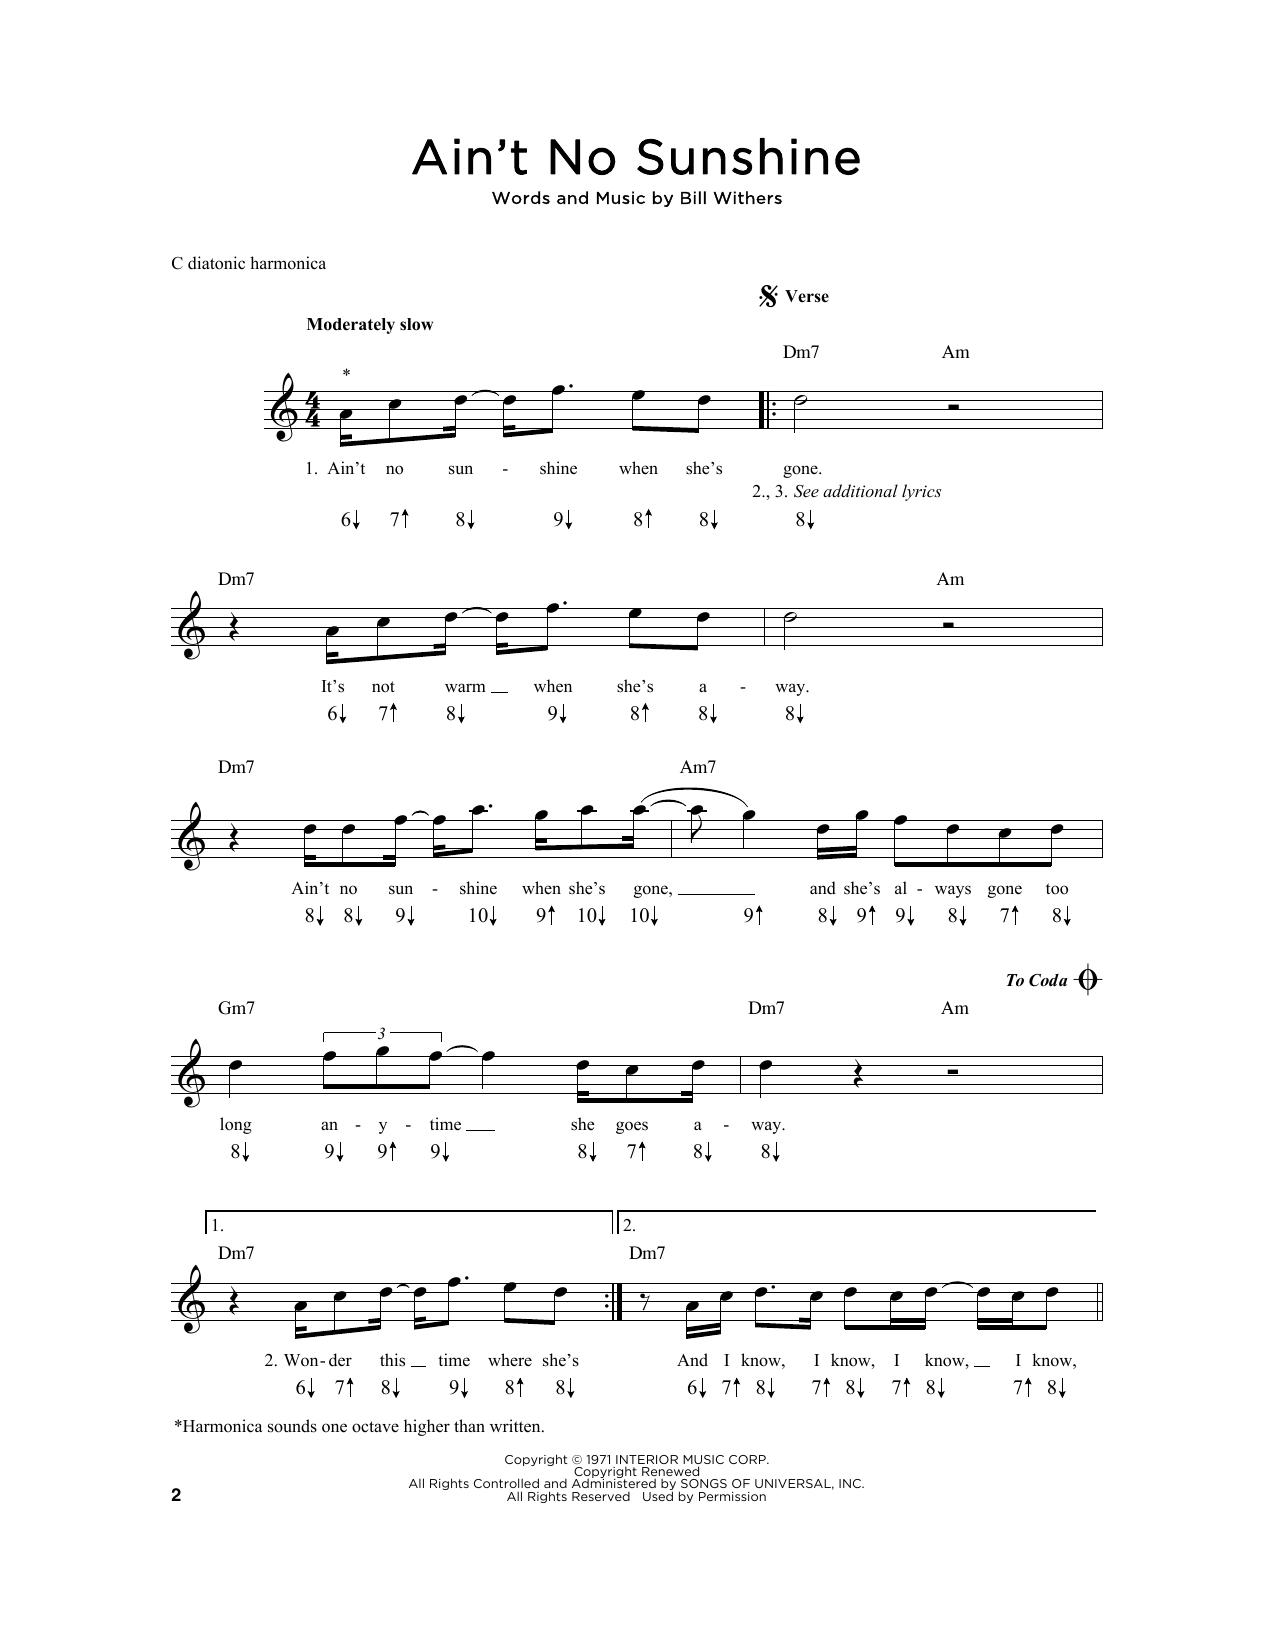 Ain T No Sunshine Chords Aint No Sunshine Sheet Music Bill Withers Harmonica